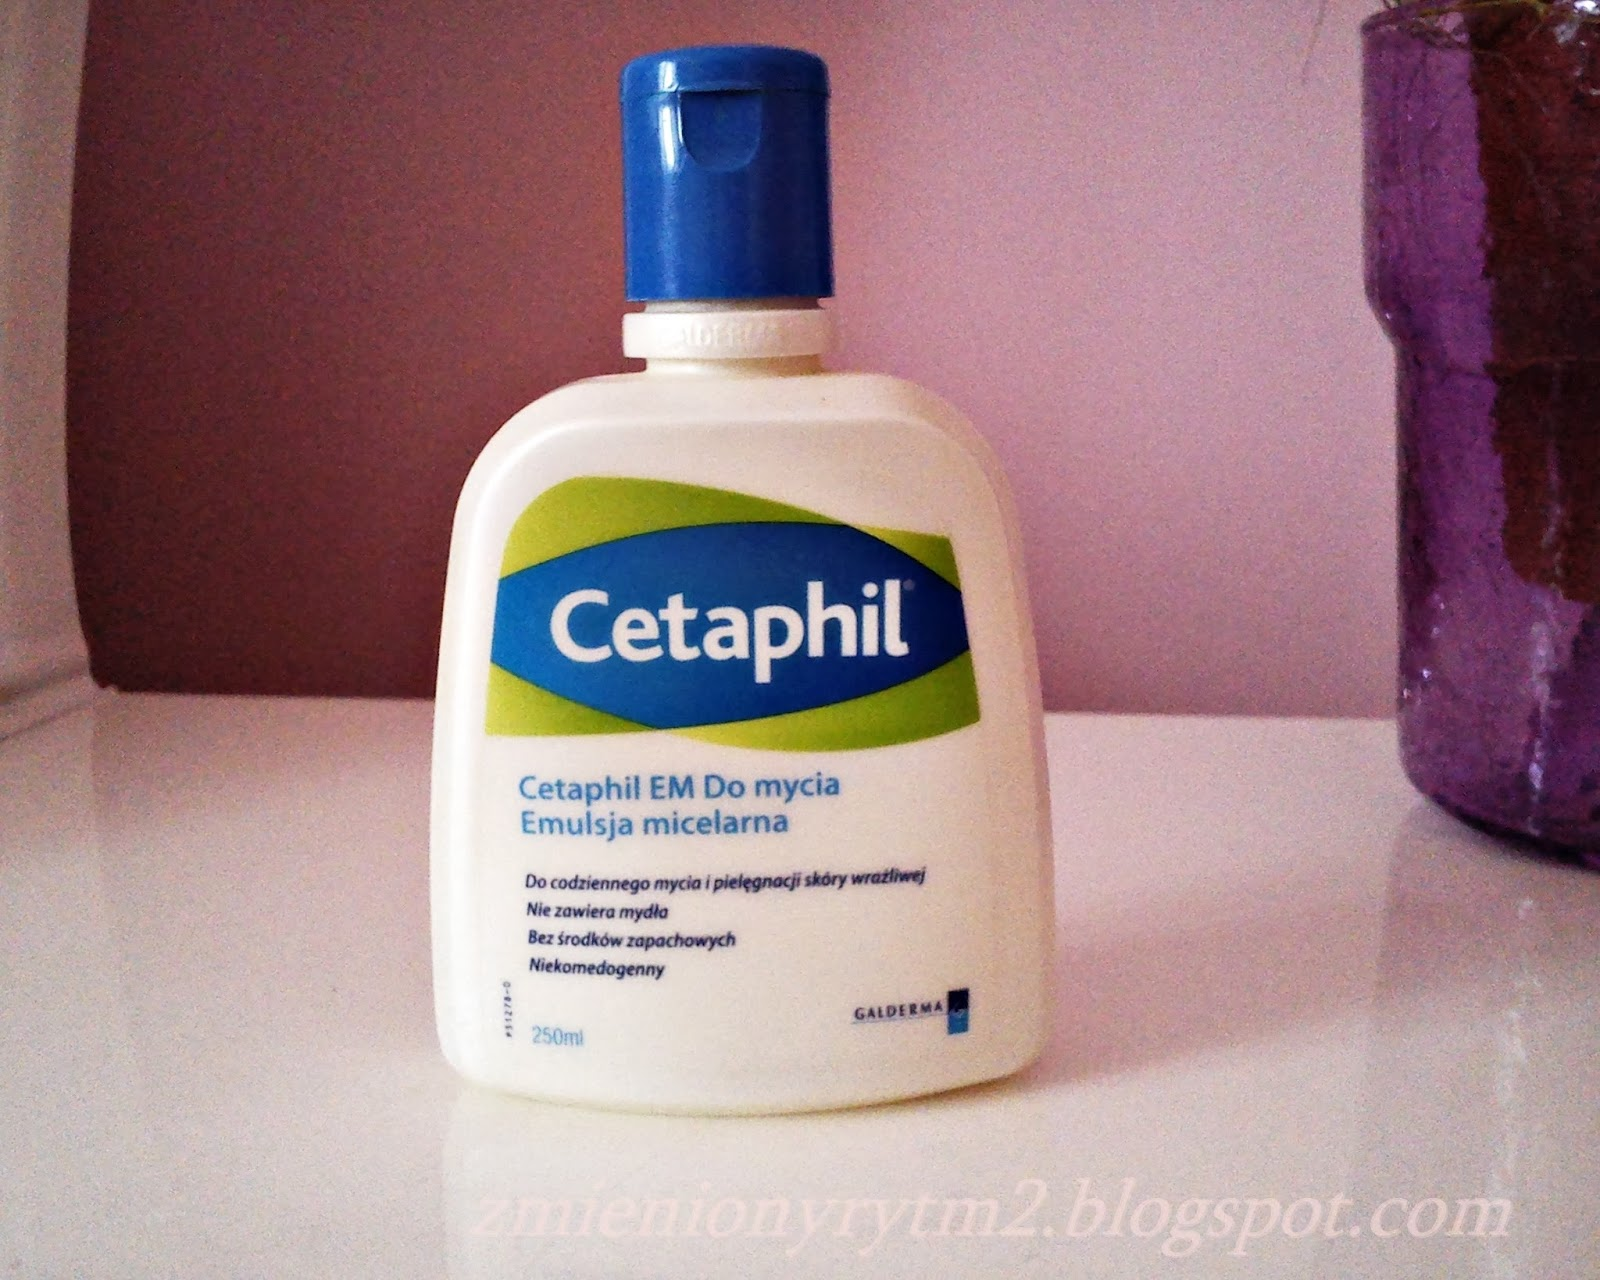 Mycie twarzy na sucho i mokro - Cetaphil, emulsja micelarna